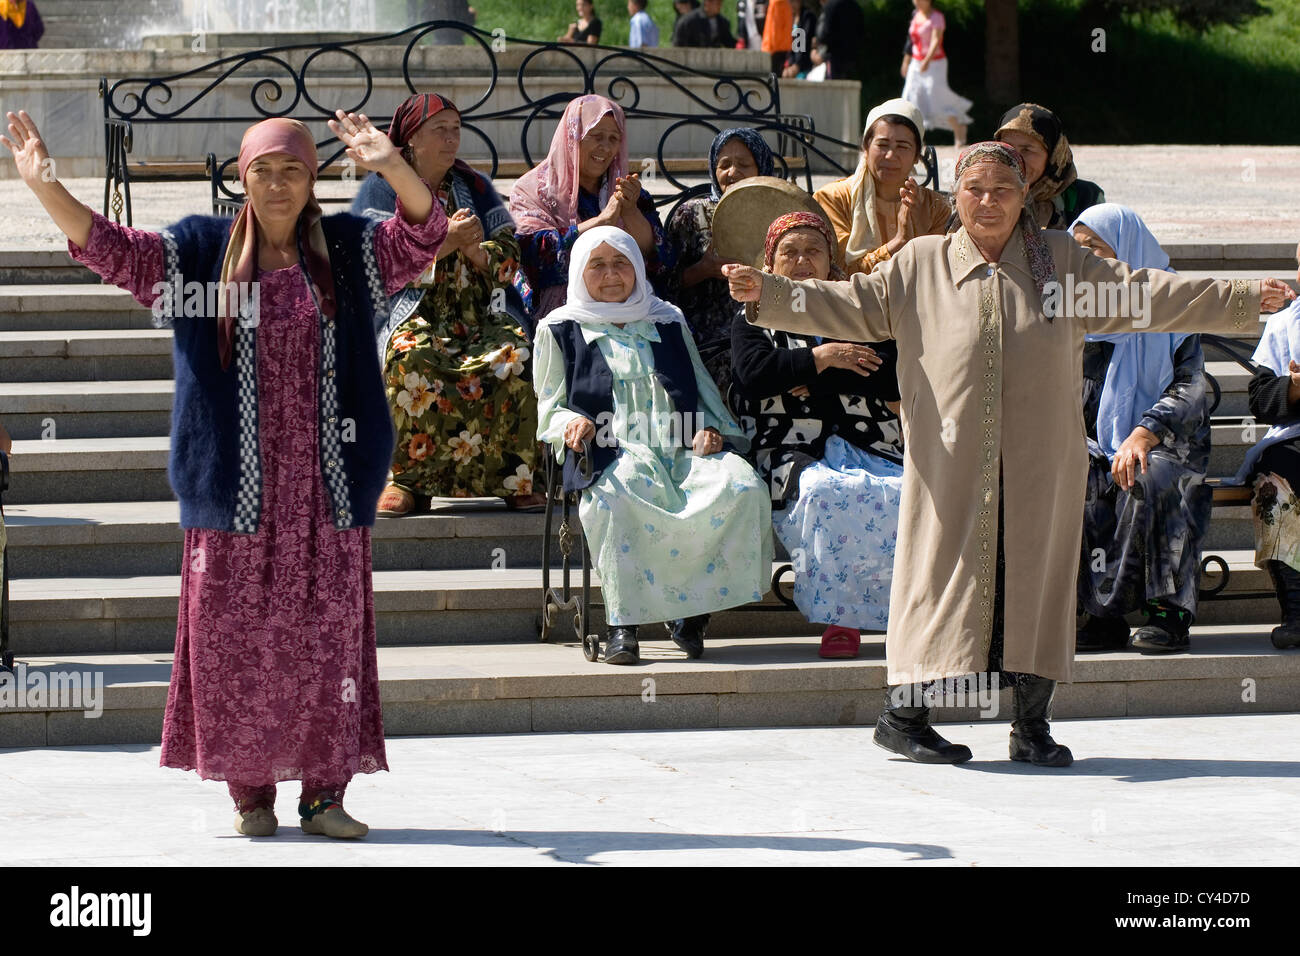 Uzbek woman having fun and dancing, Samarkand, Uzbekistan Stock Photo